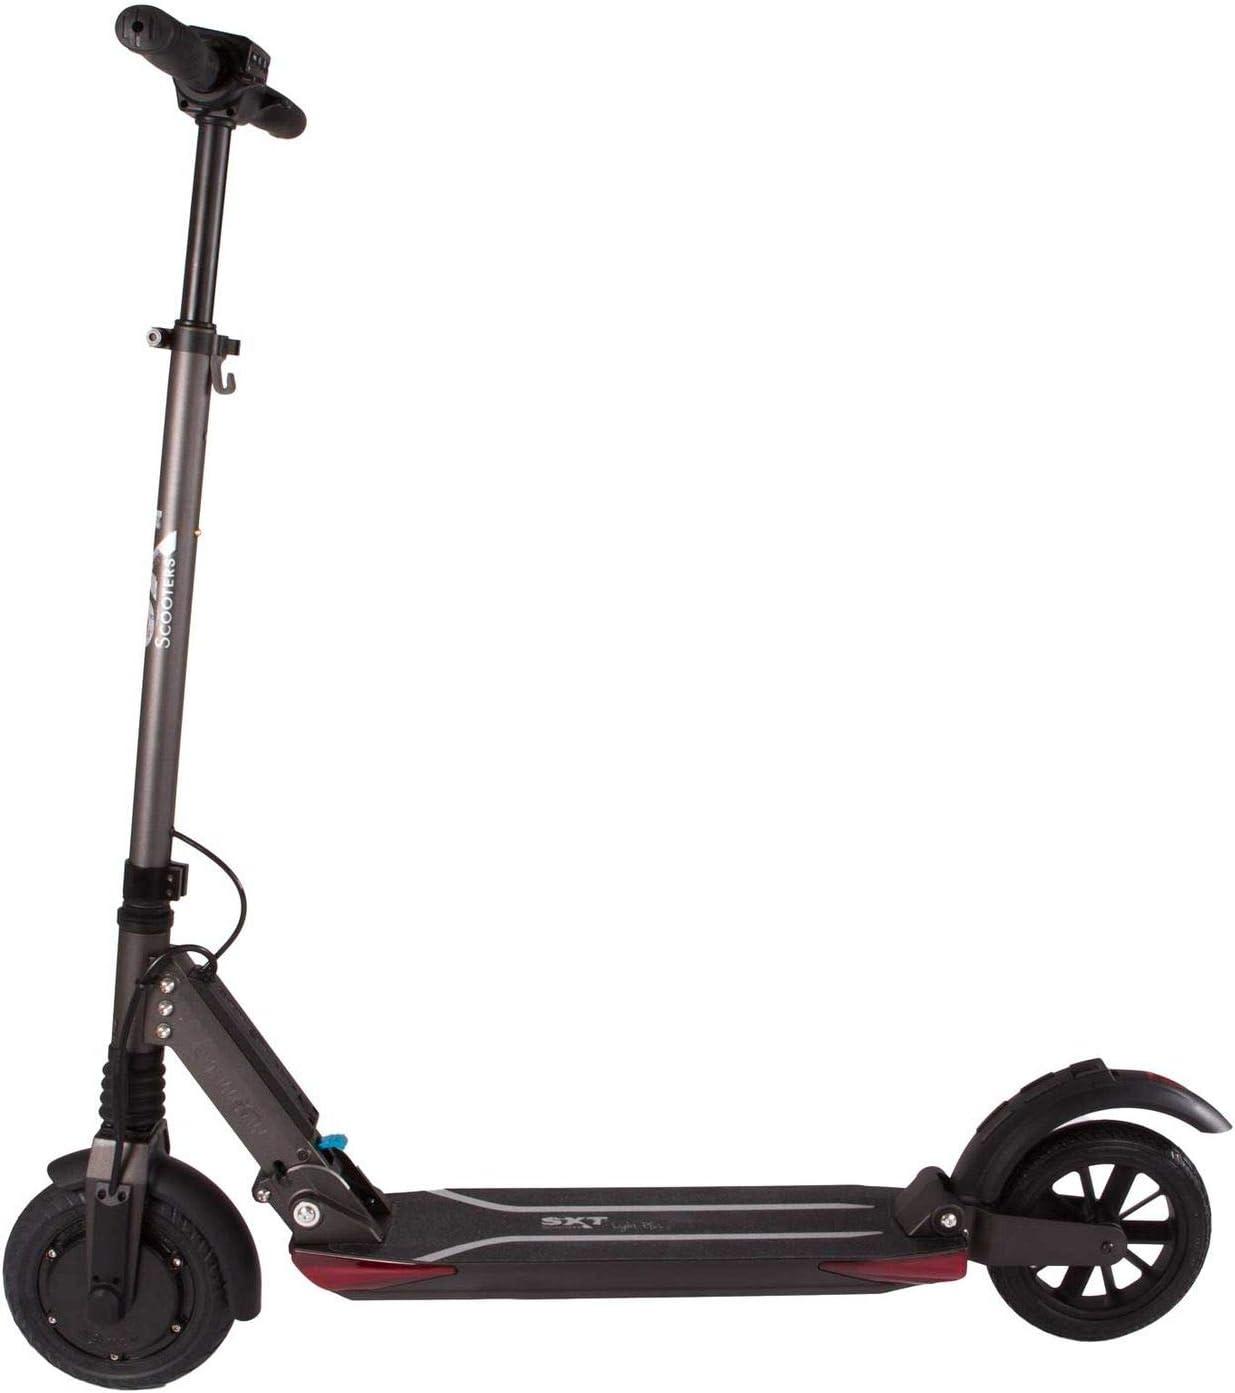 SXT Light Plus V/Facelift Escooter kaufen